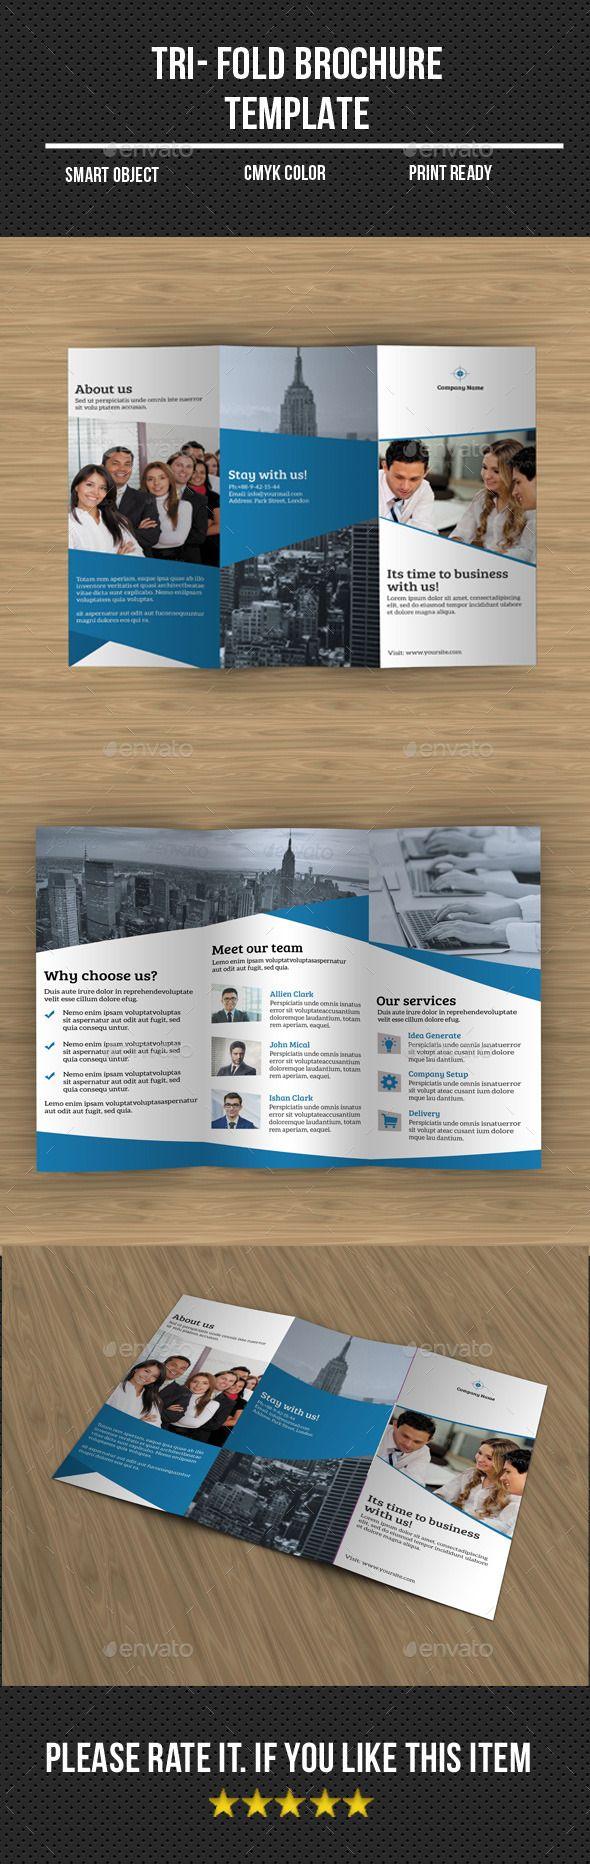 informational brochure template